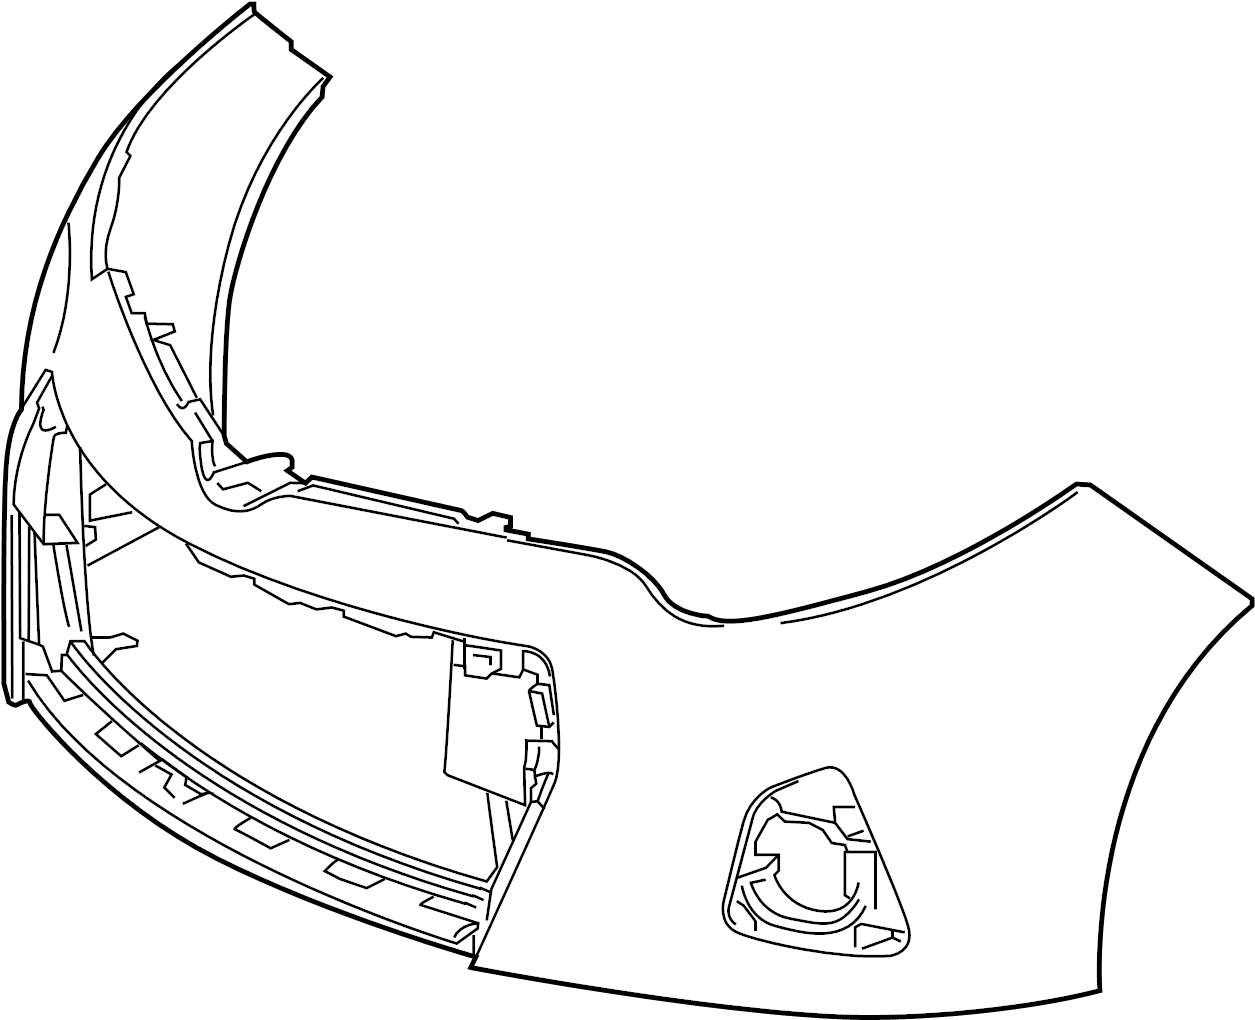 Toyota Corolla Bumper Cover Front Upper Component